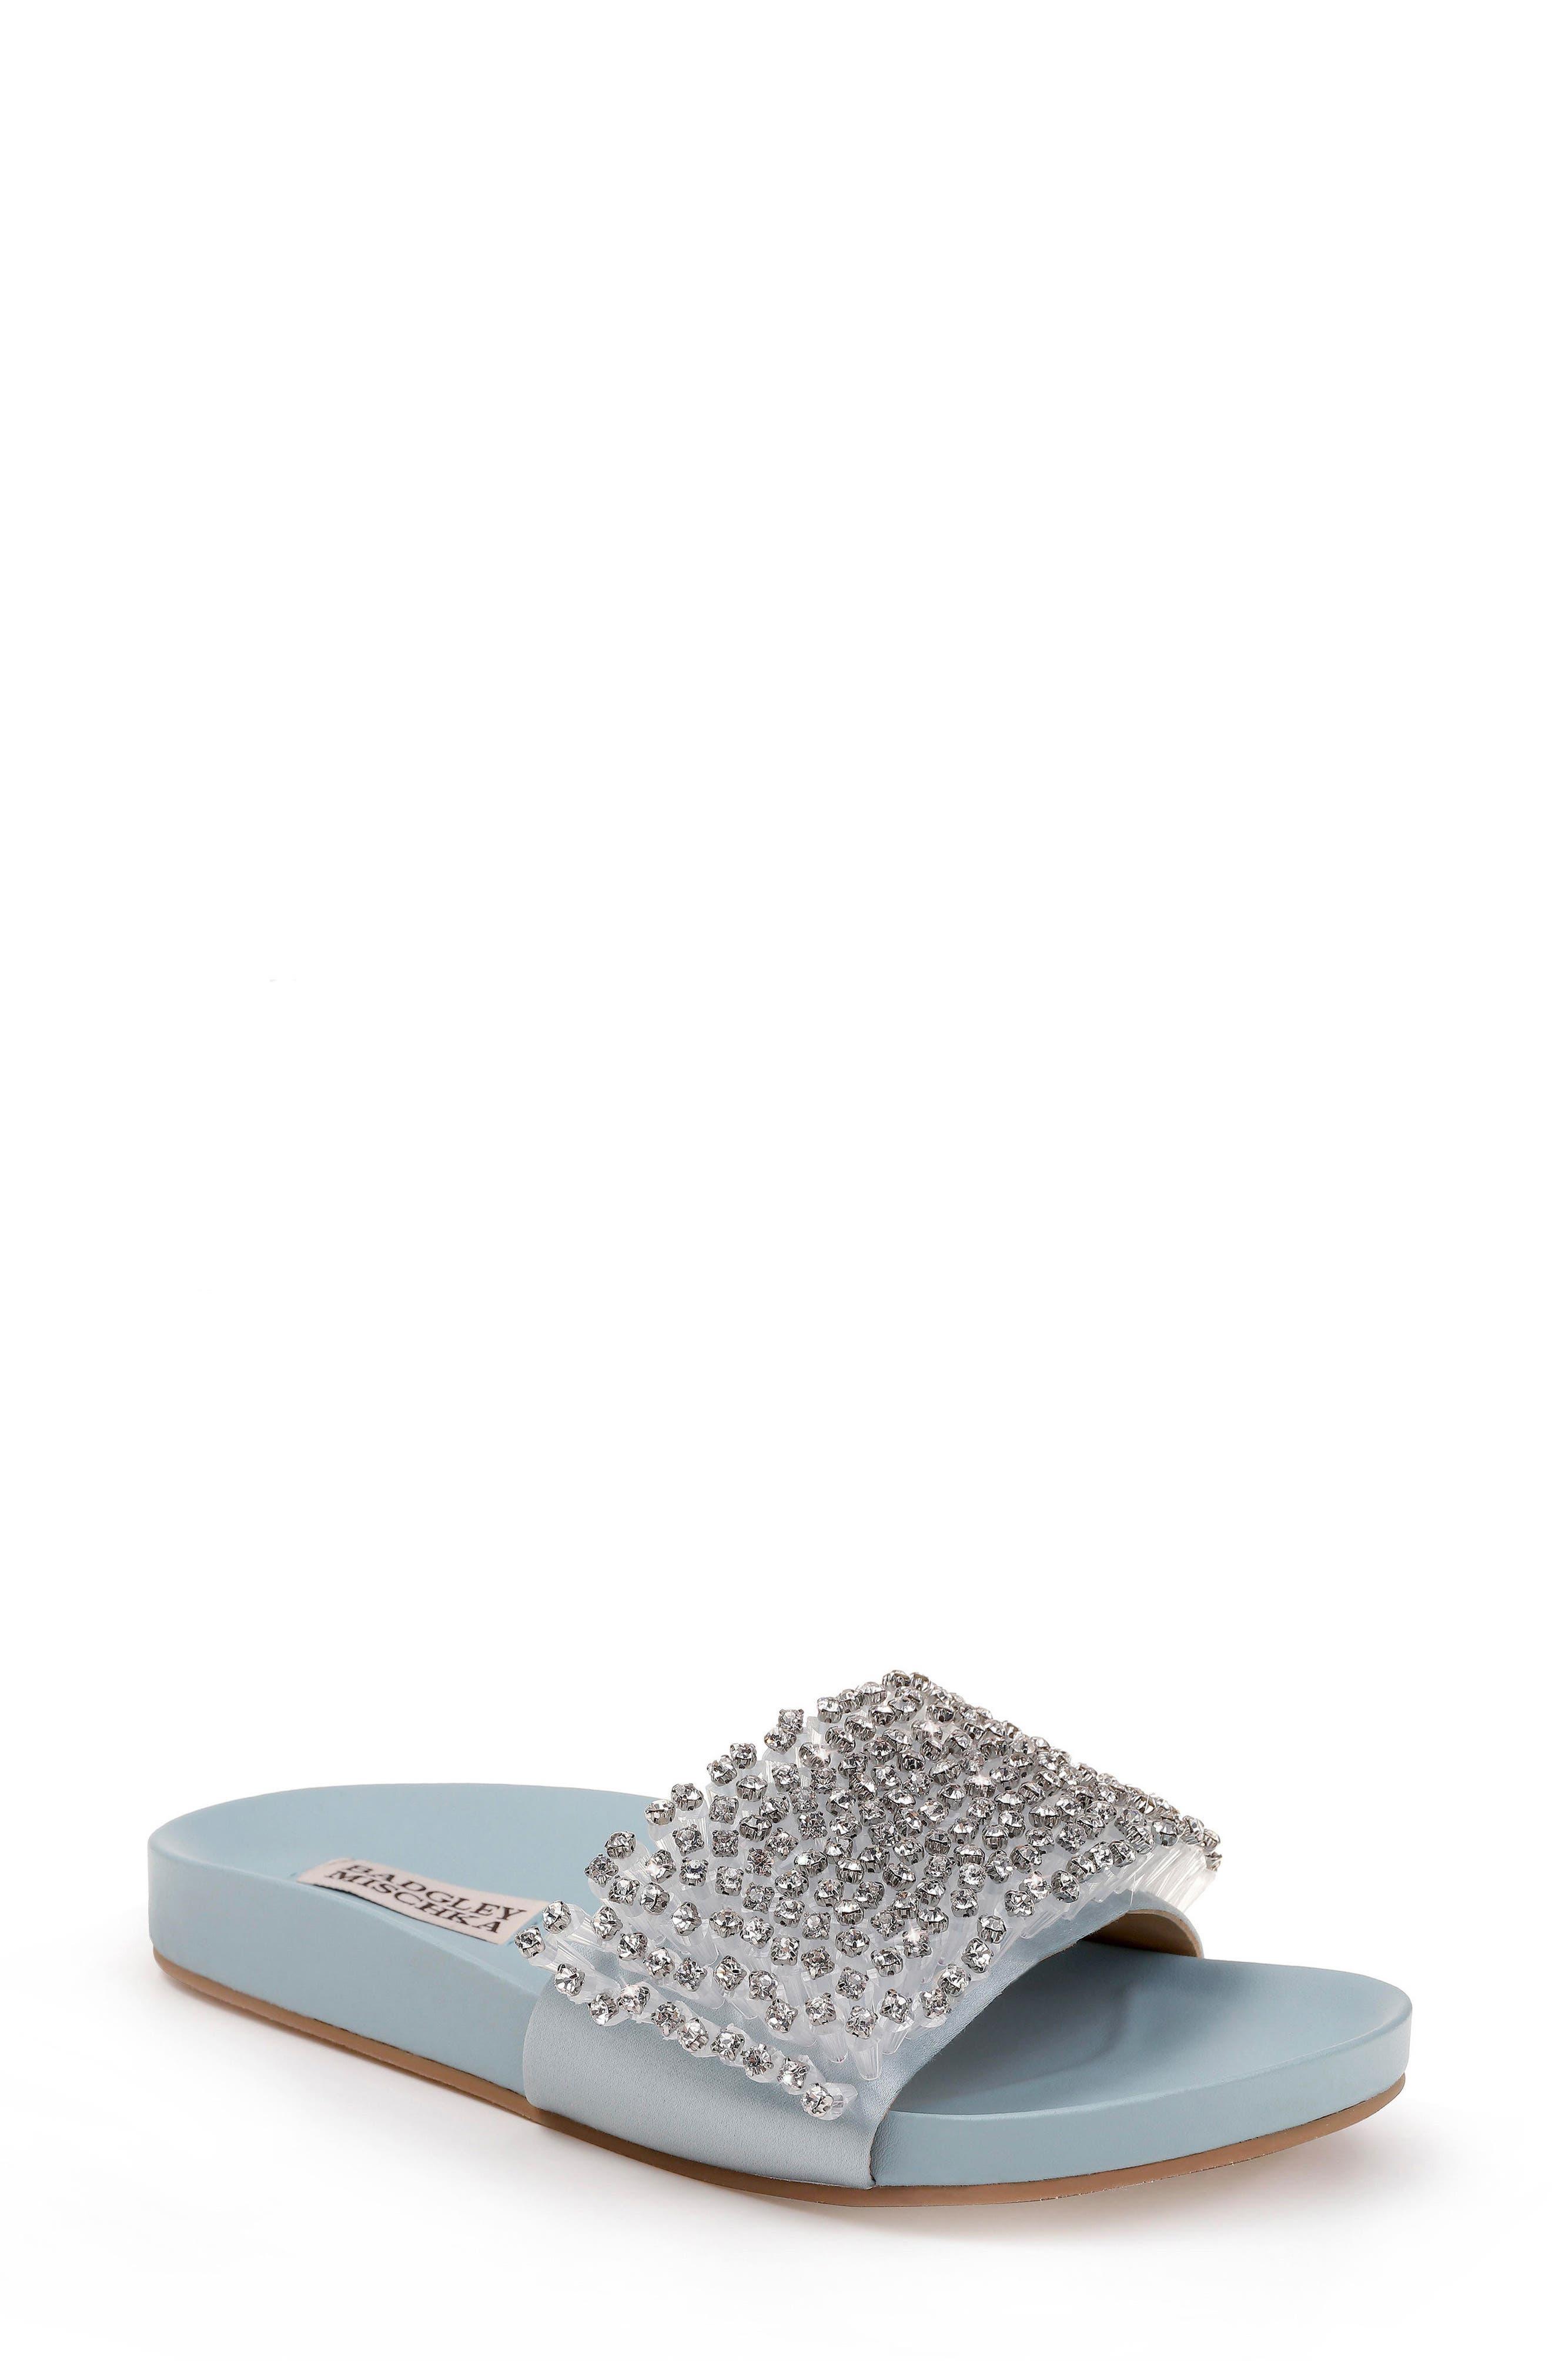 Horton Crystal Embellished Sandal,                             Main thumbnail 3, color,